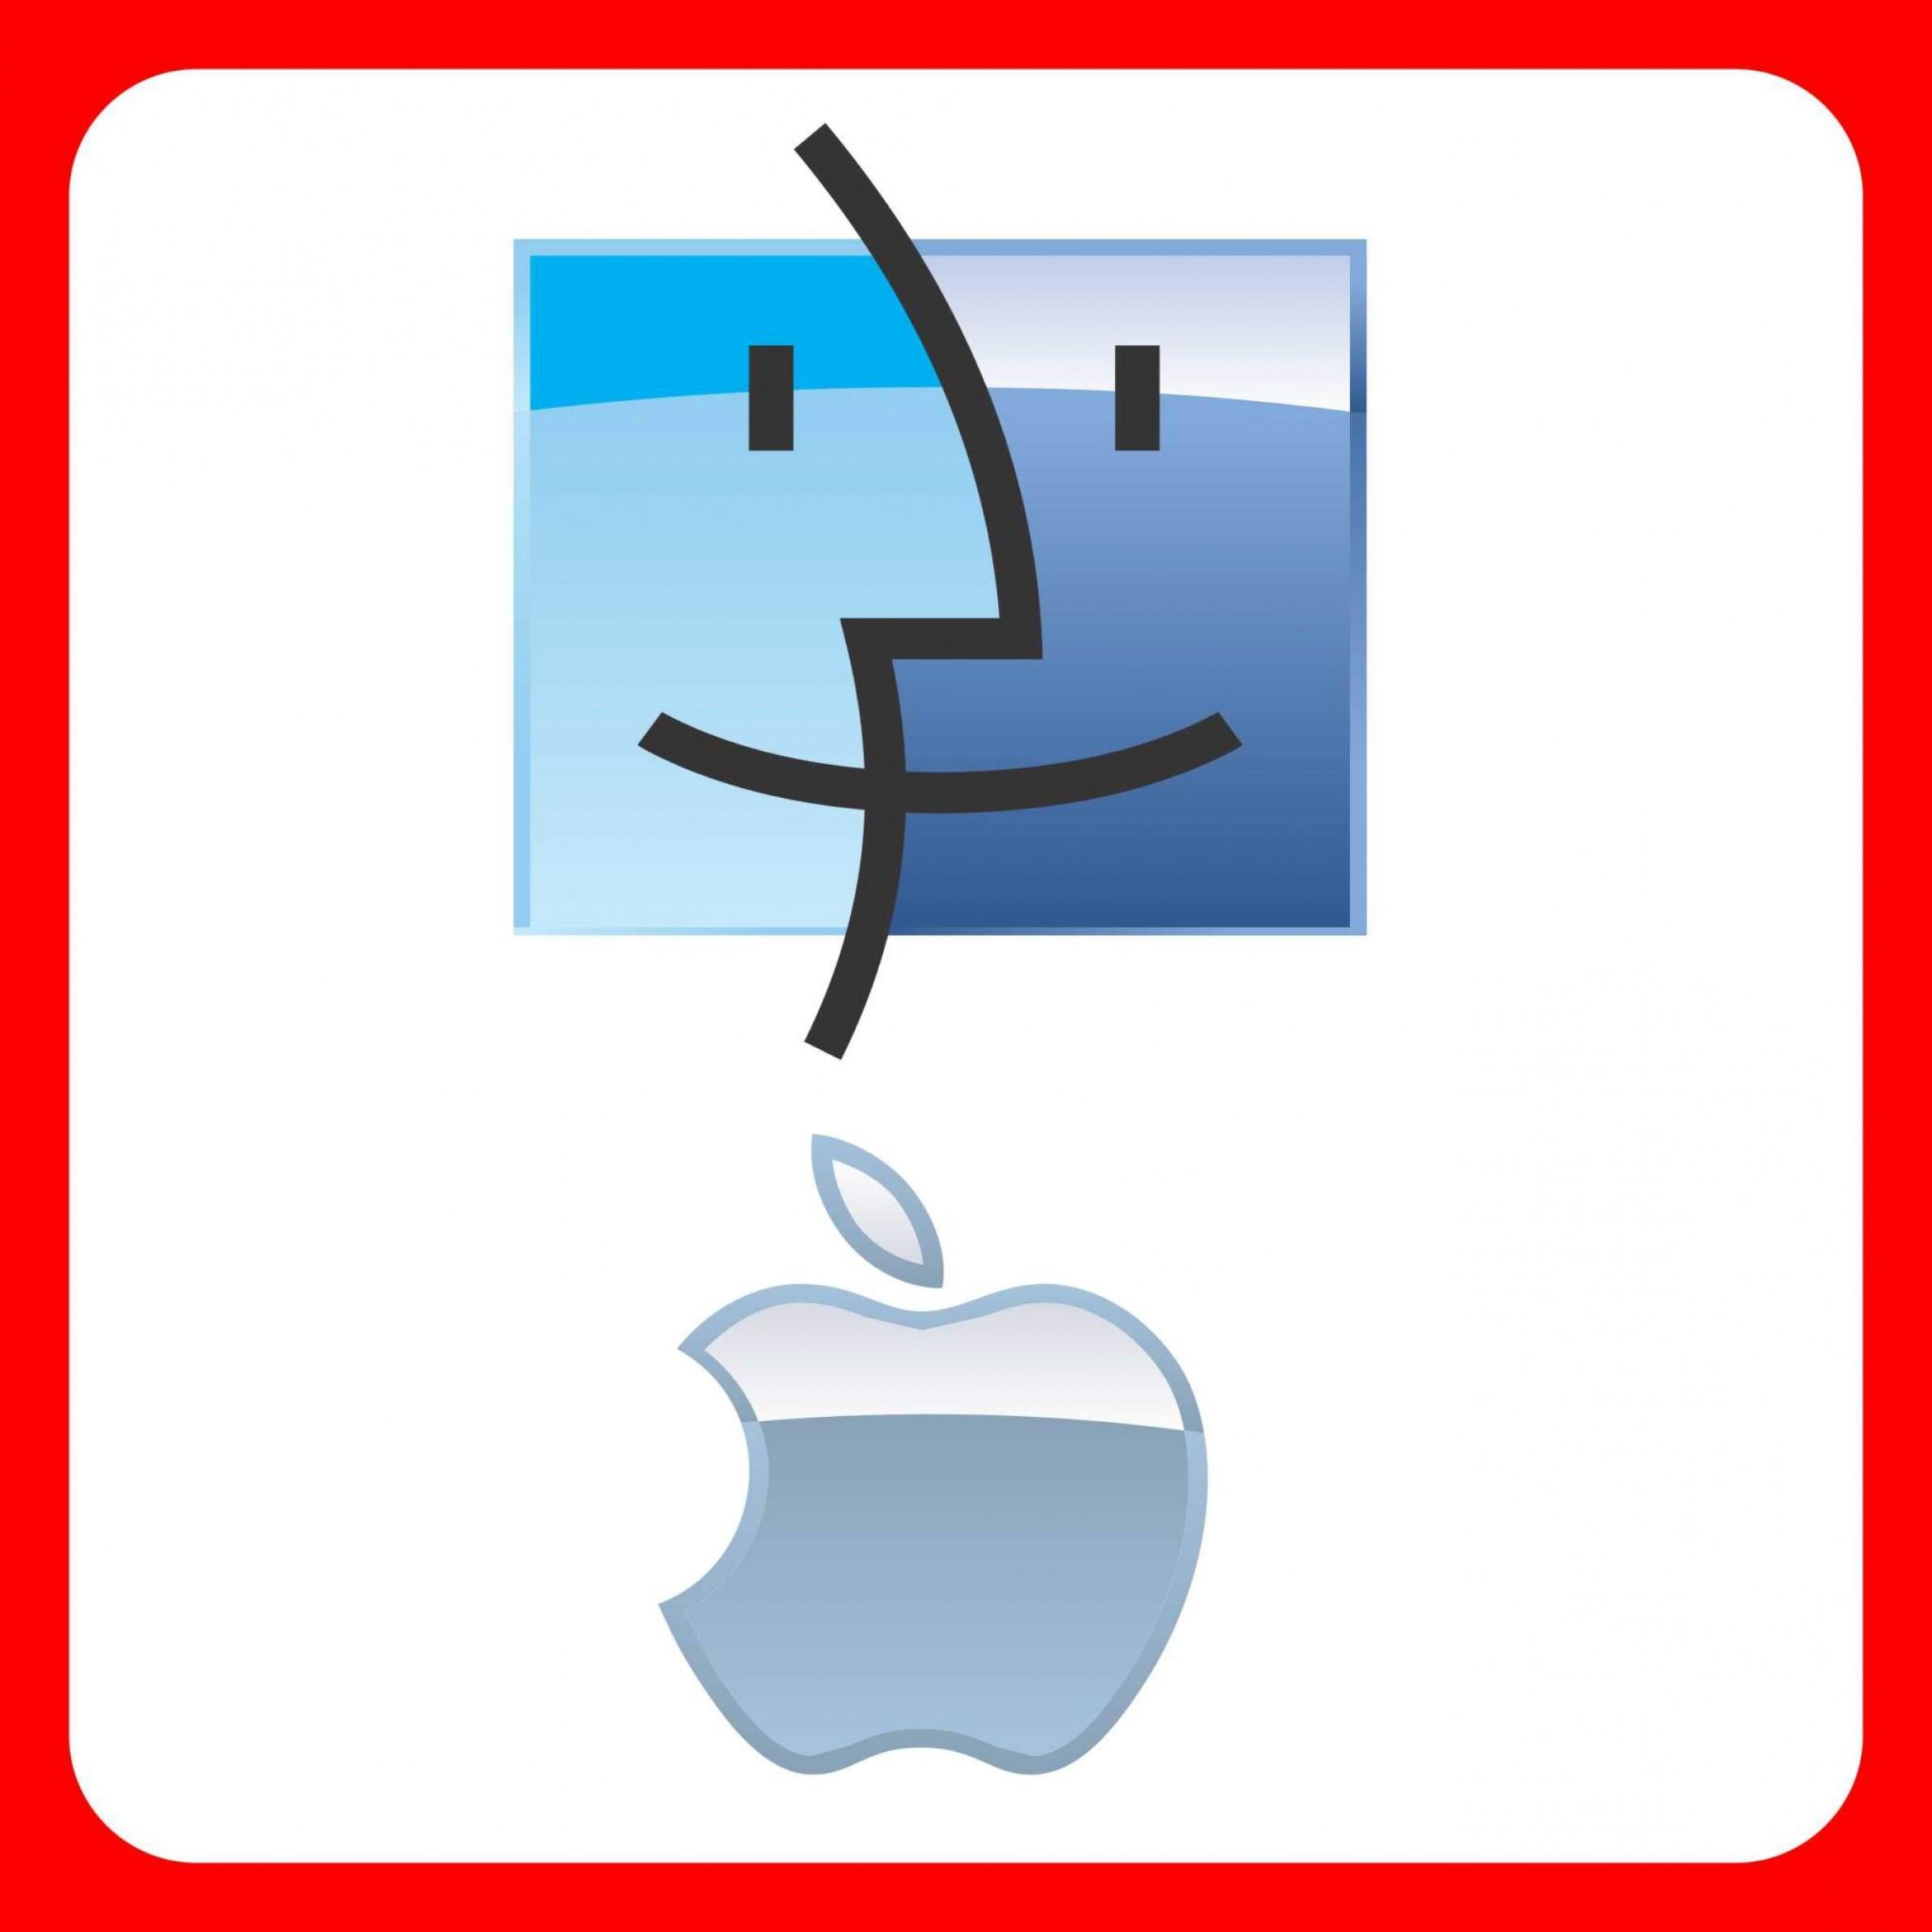 Apple Logo Cdr File Coreldraw X.